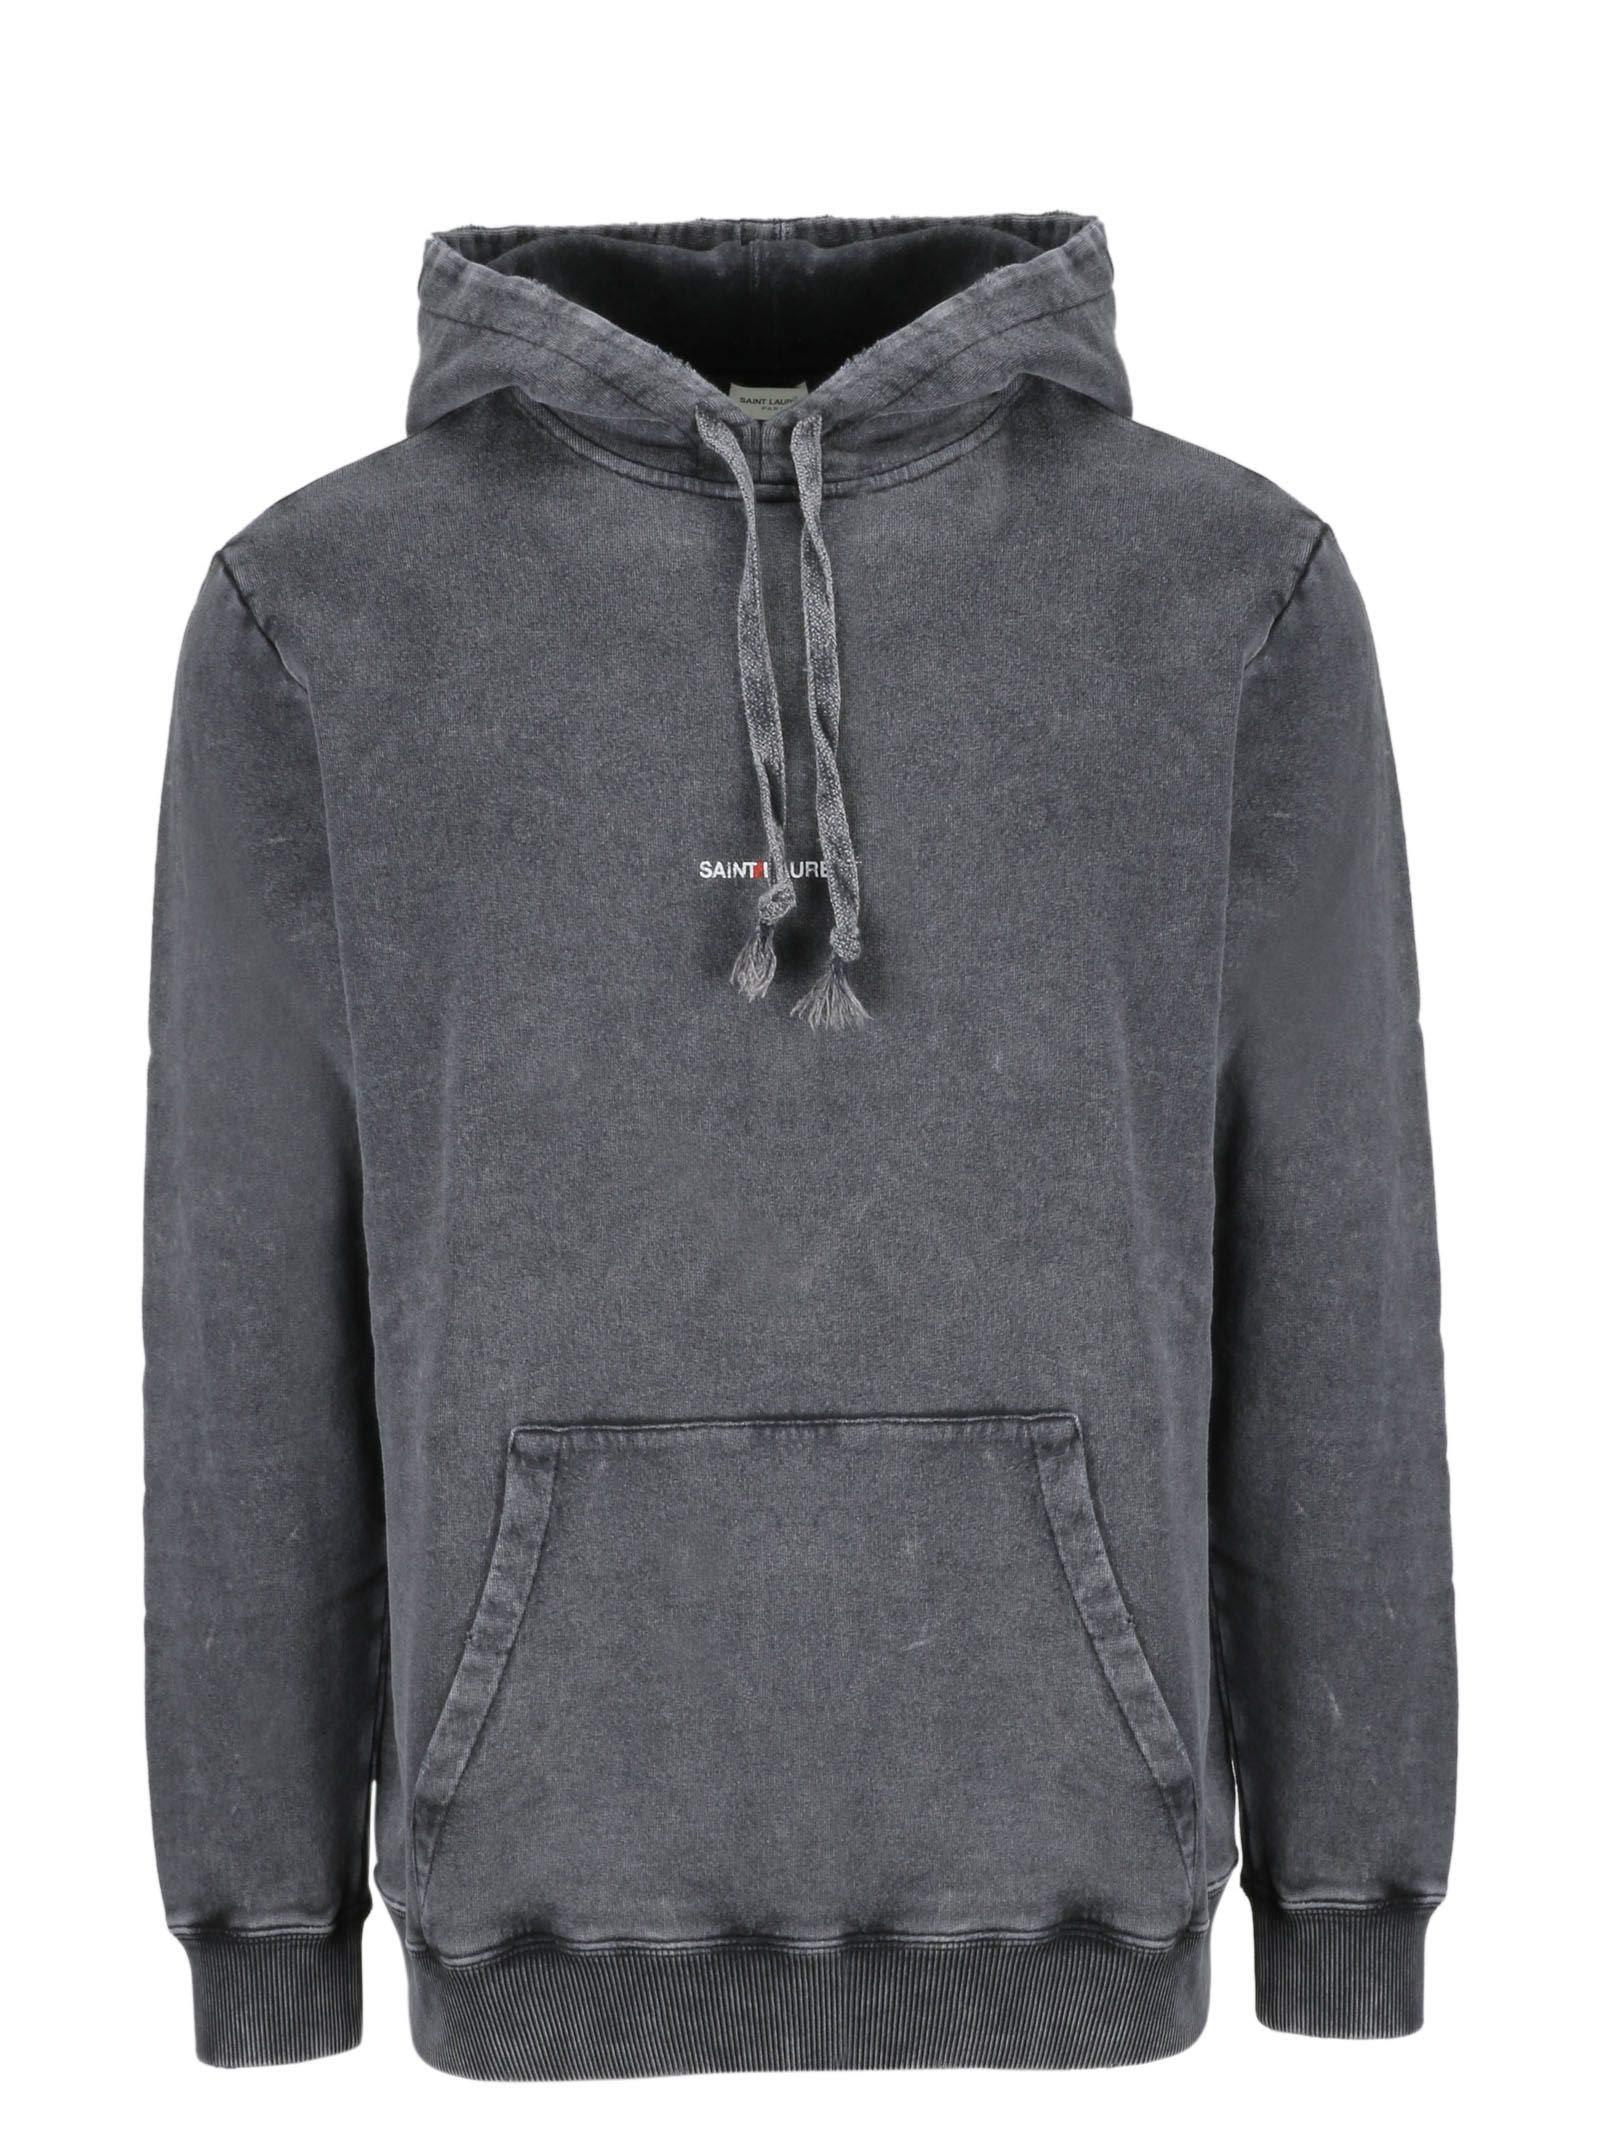 Saint Laurent Men's 500648Yb2mf1059 Grey Cotton Sweatshirt